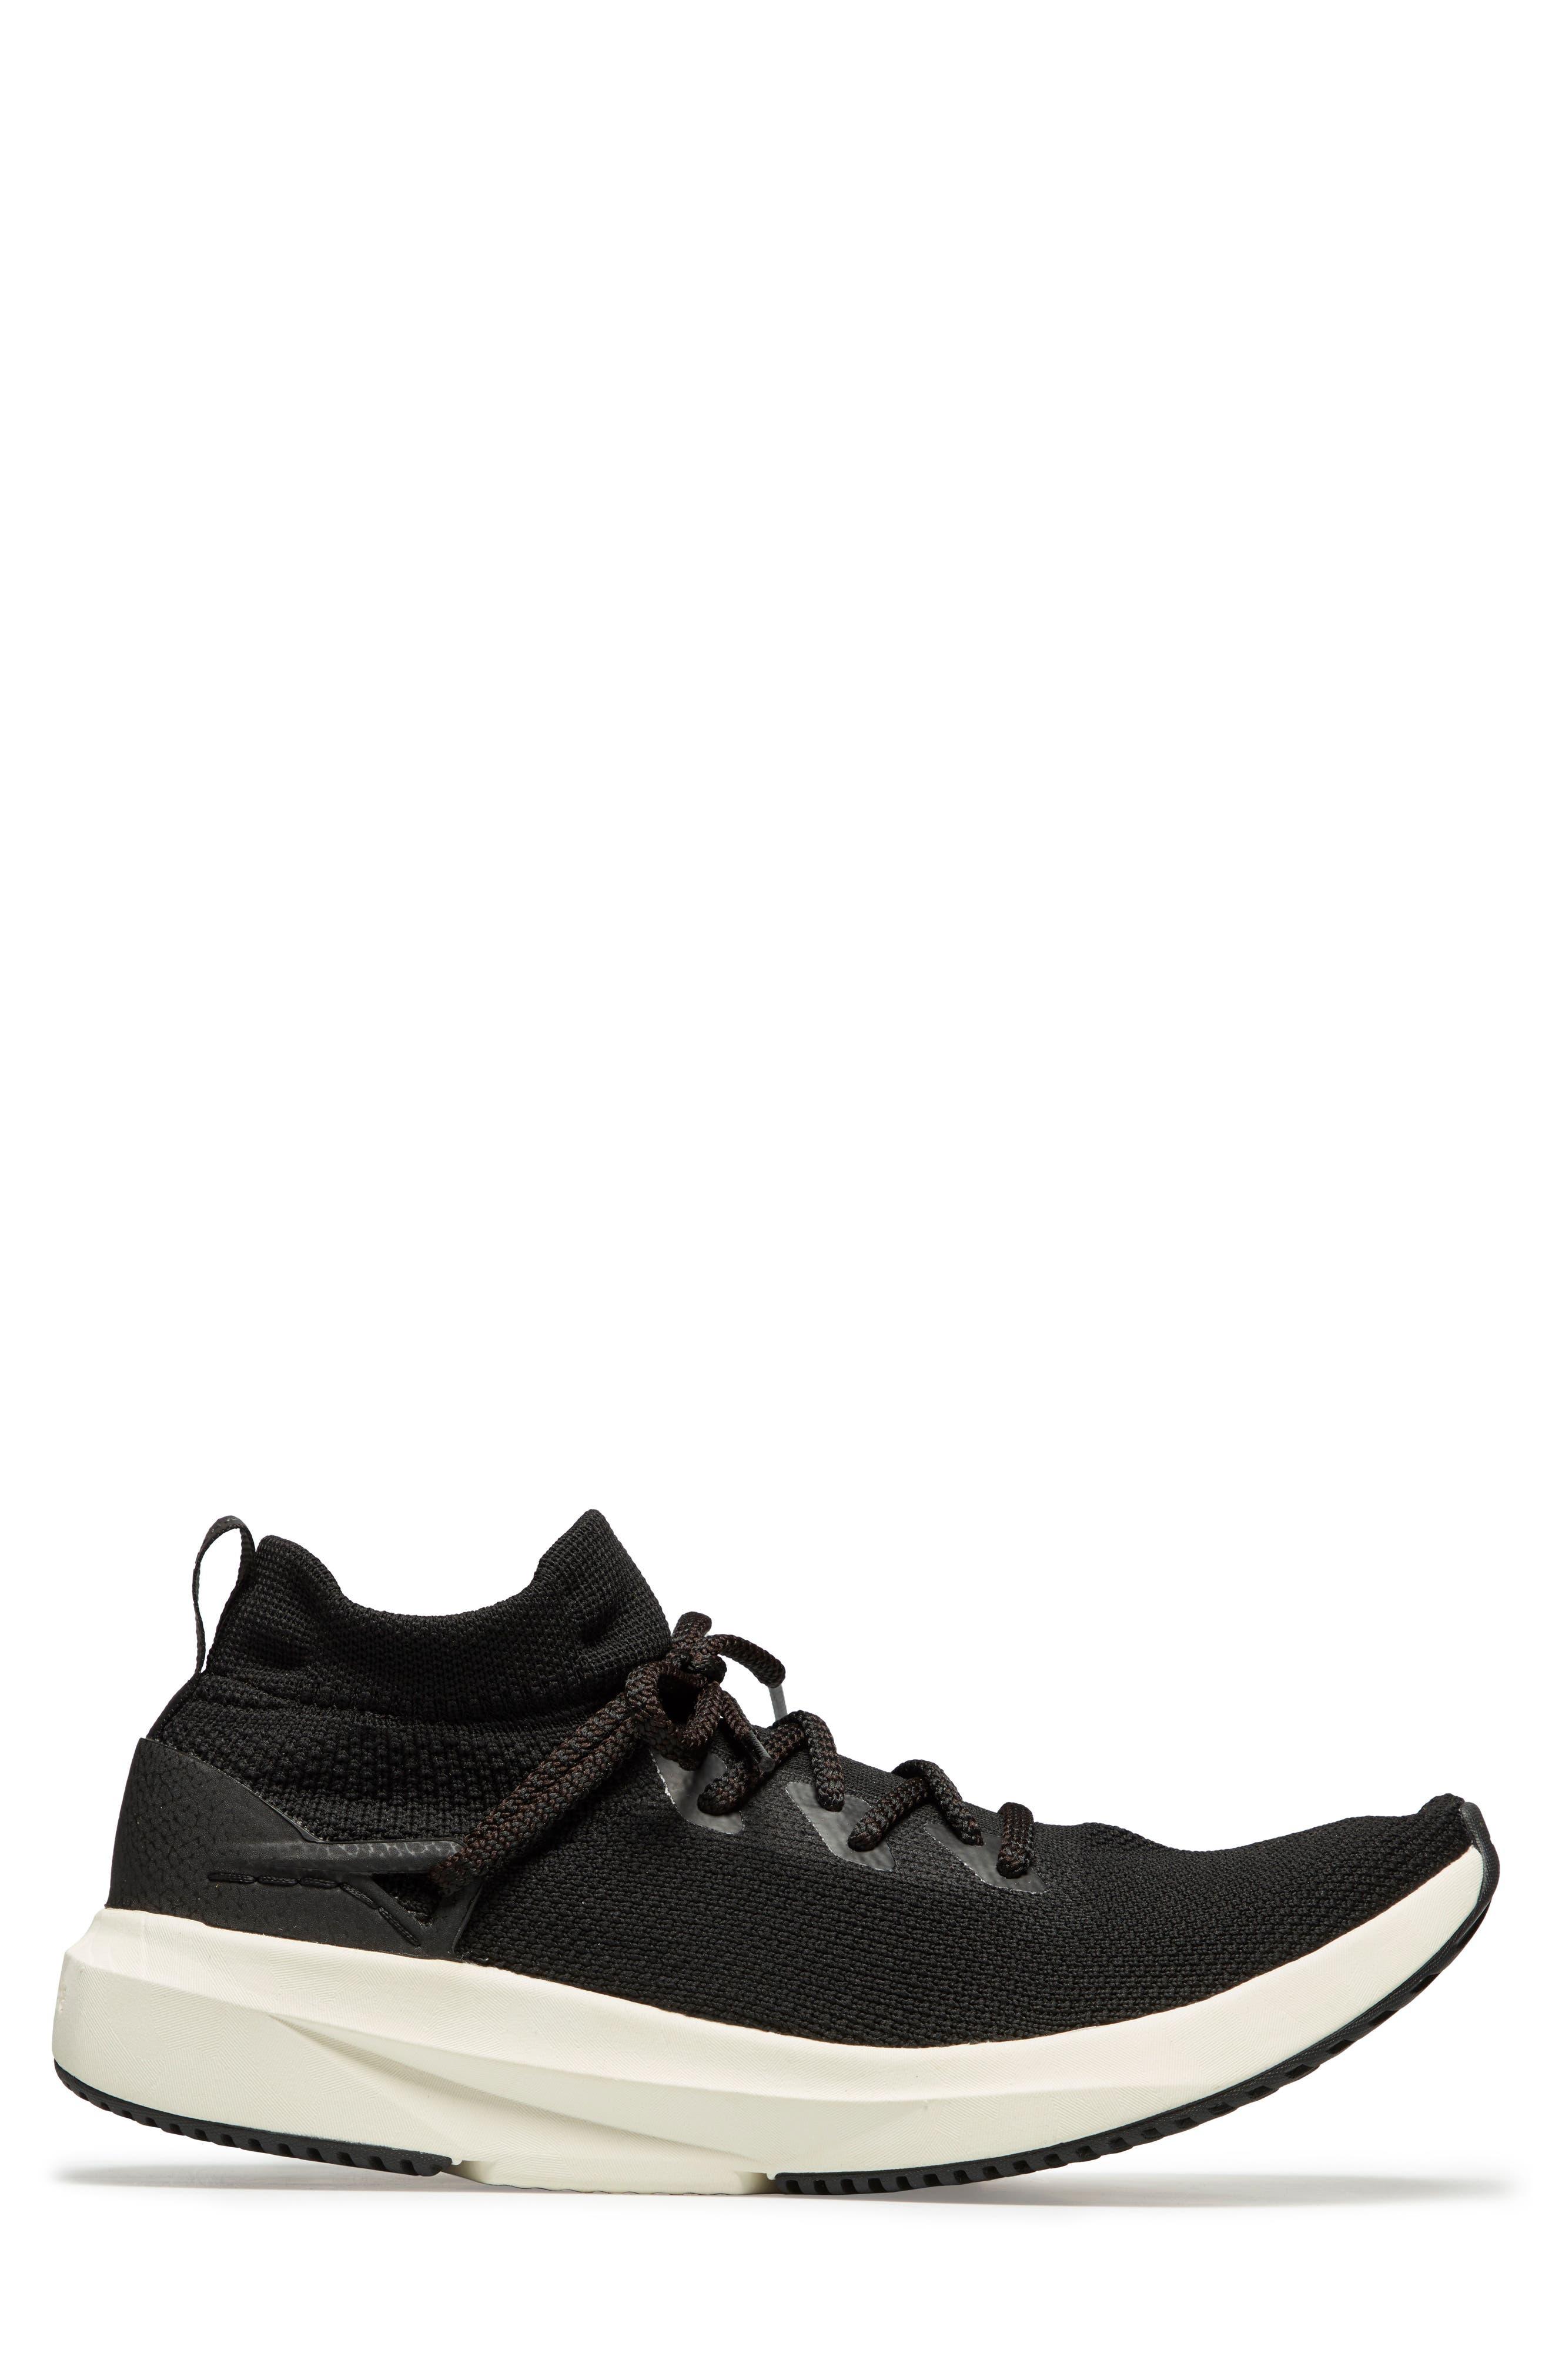 Kaze Sneaker,                             Alternate thumbnail 3, color,                             011